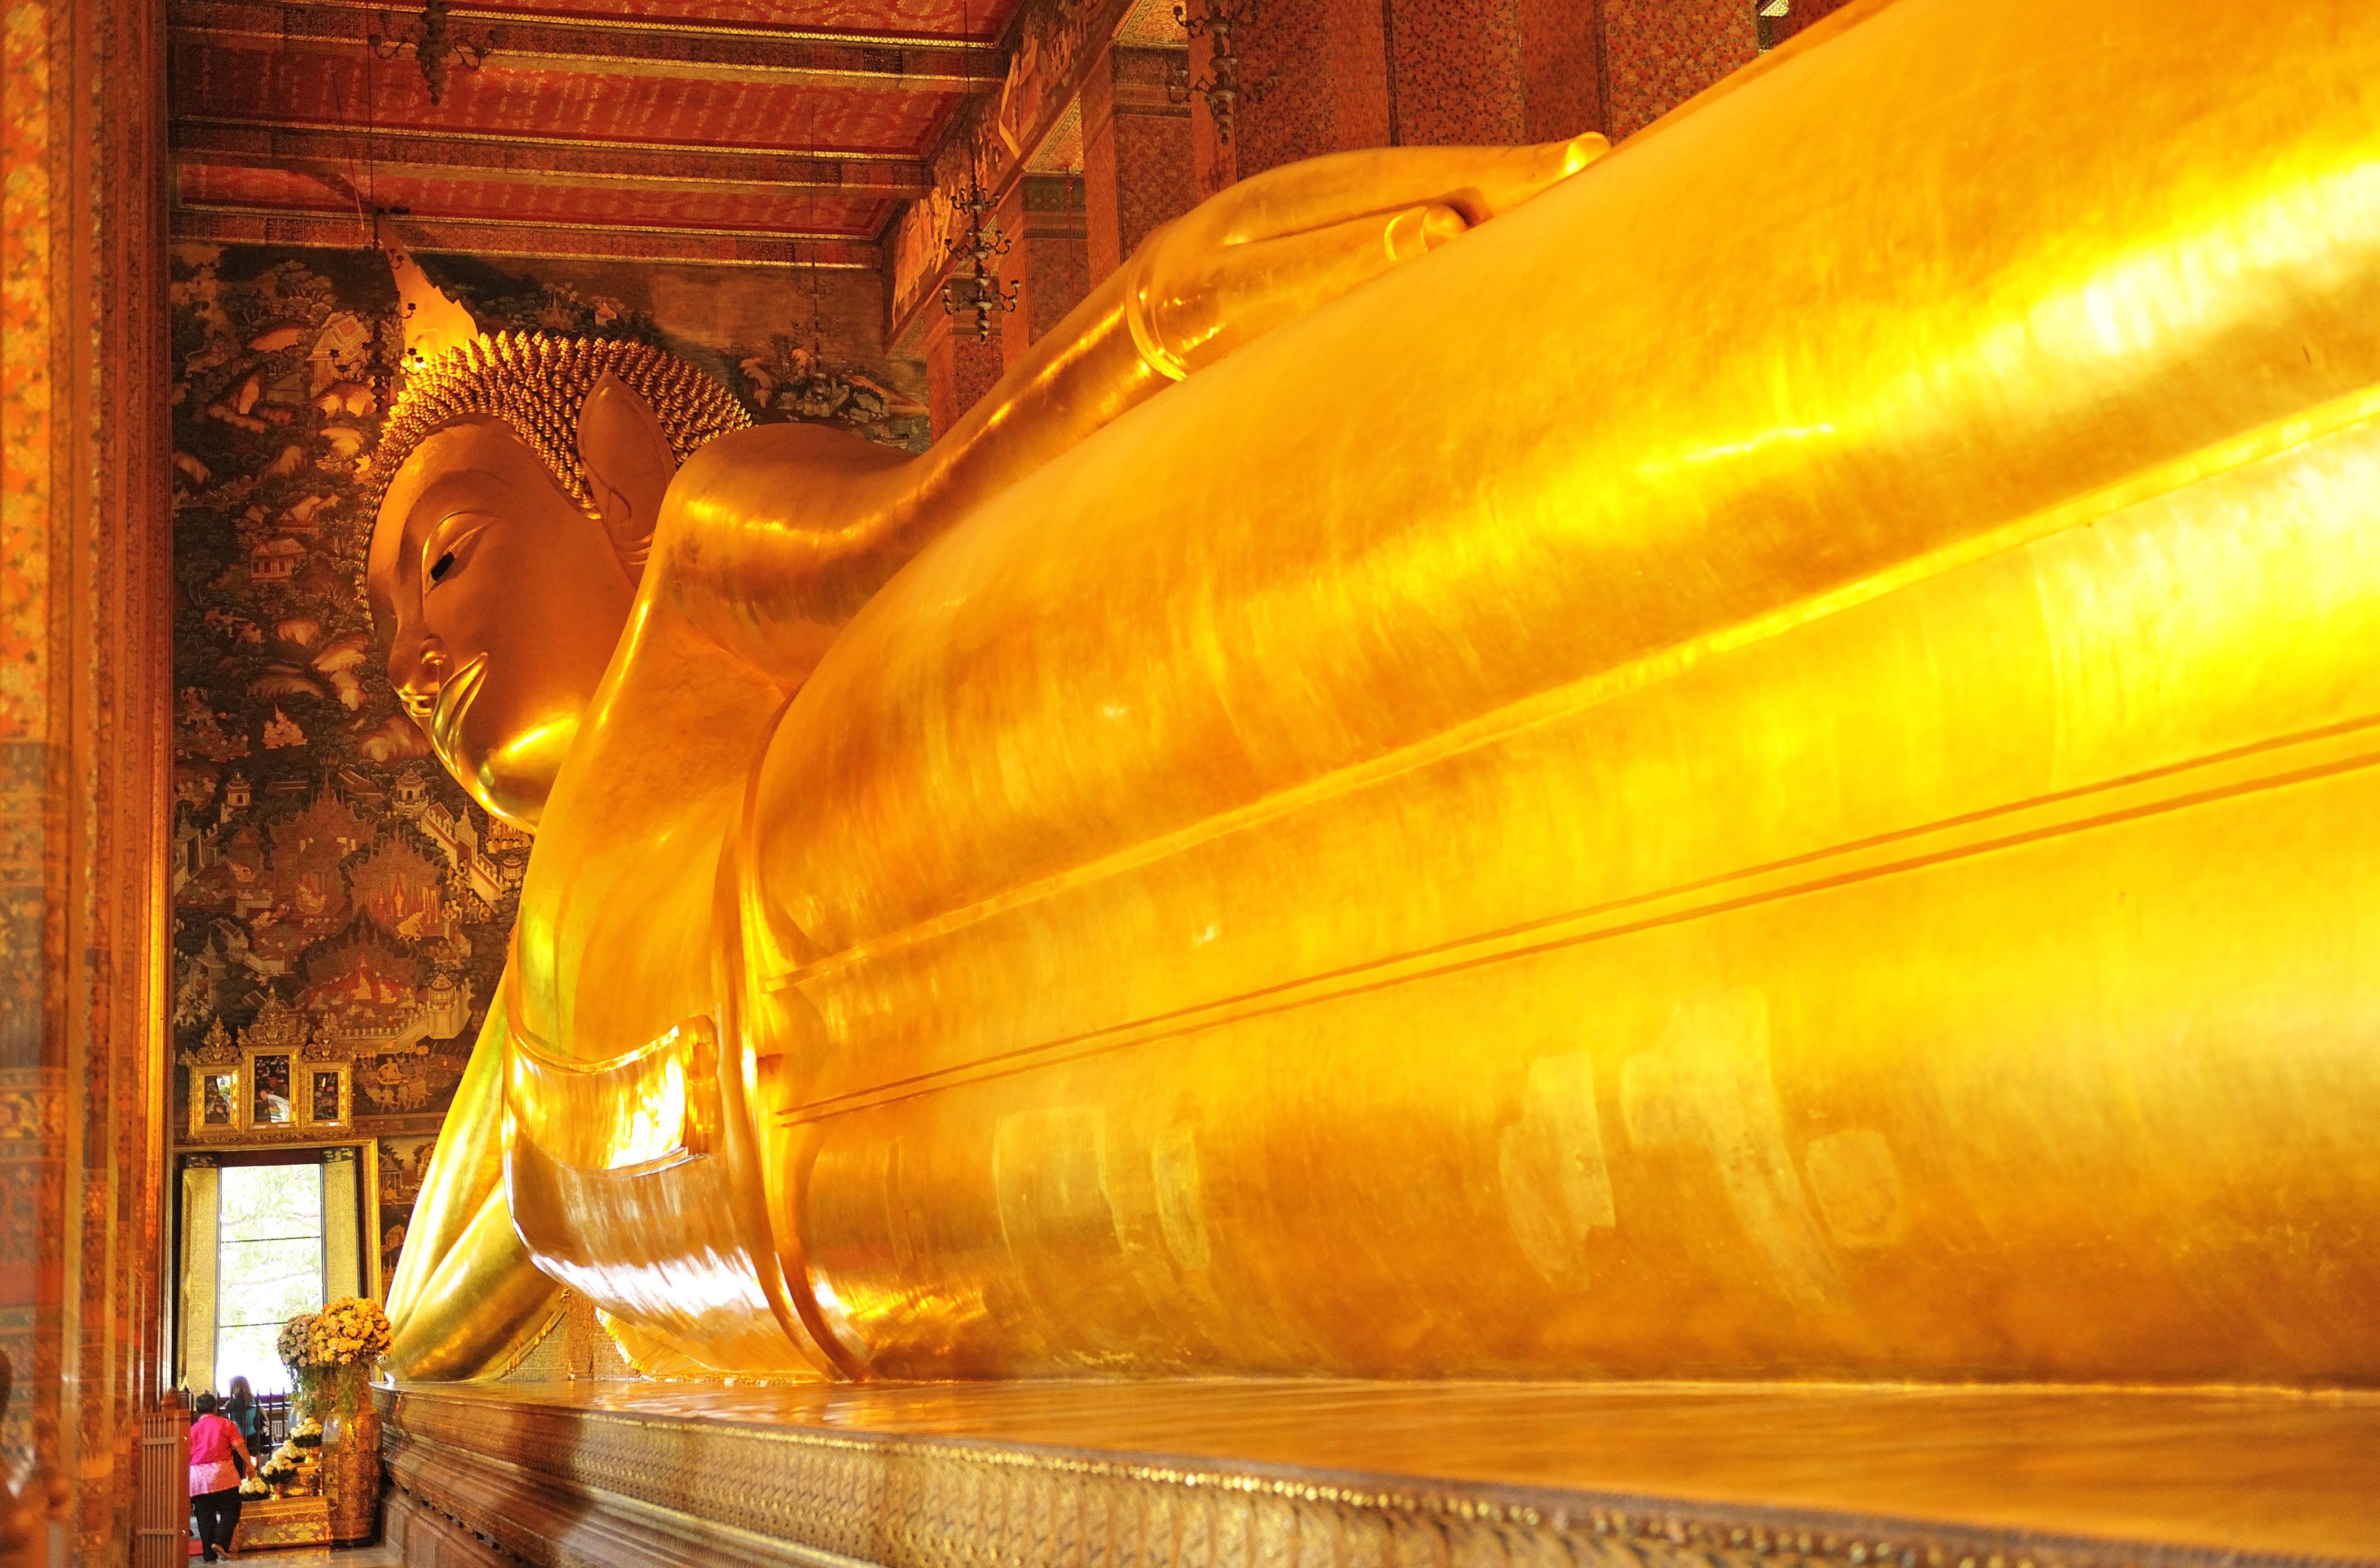 The reclining Buddha statue in Wat Pho, Bangkok